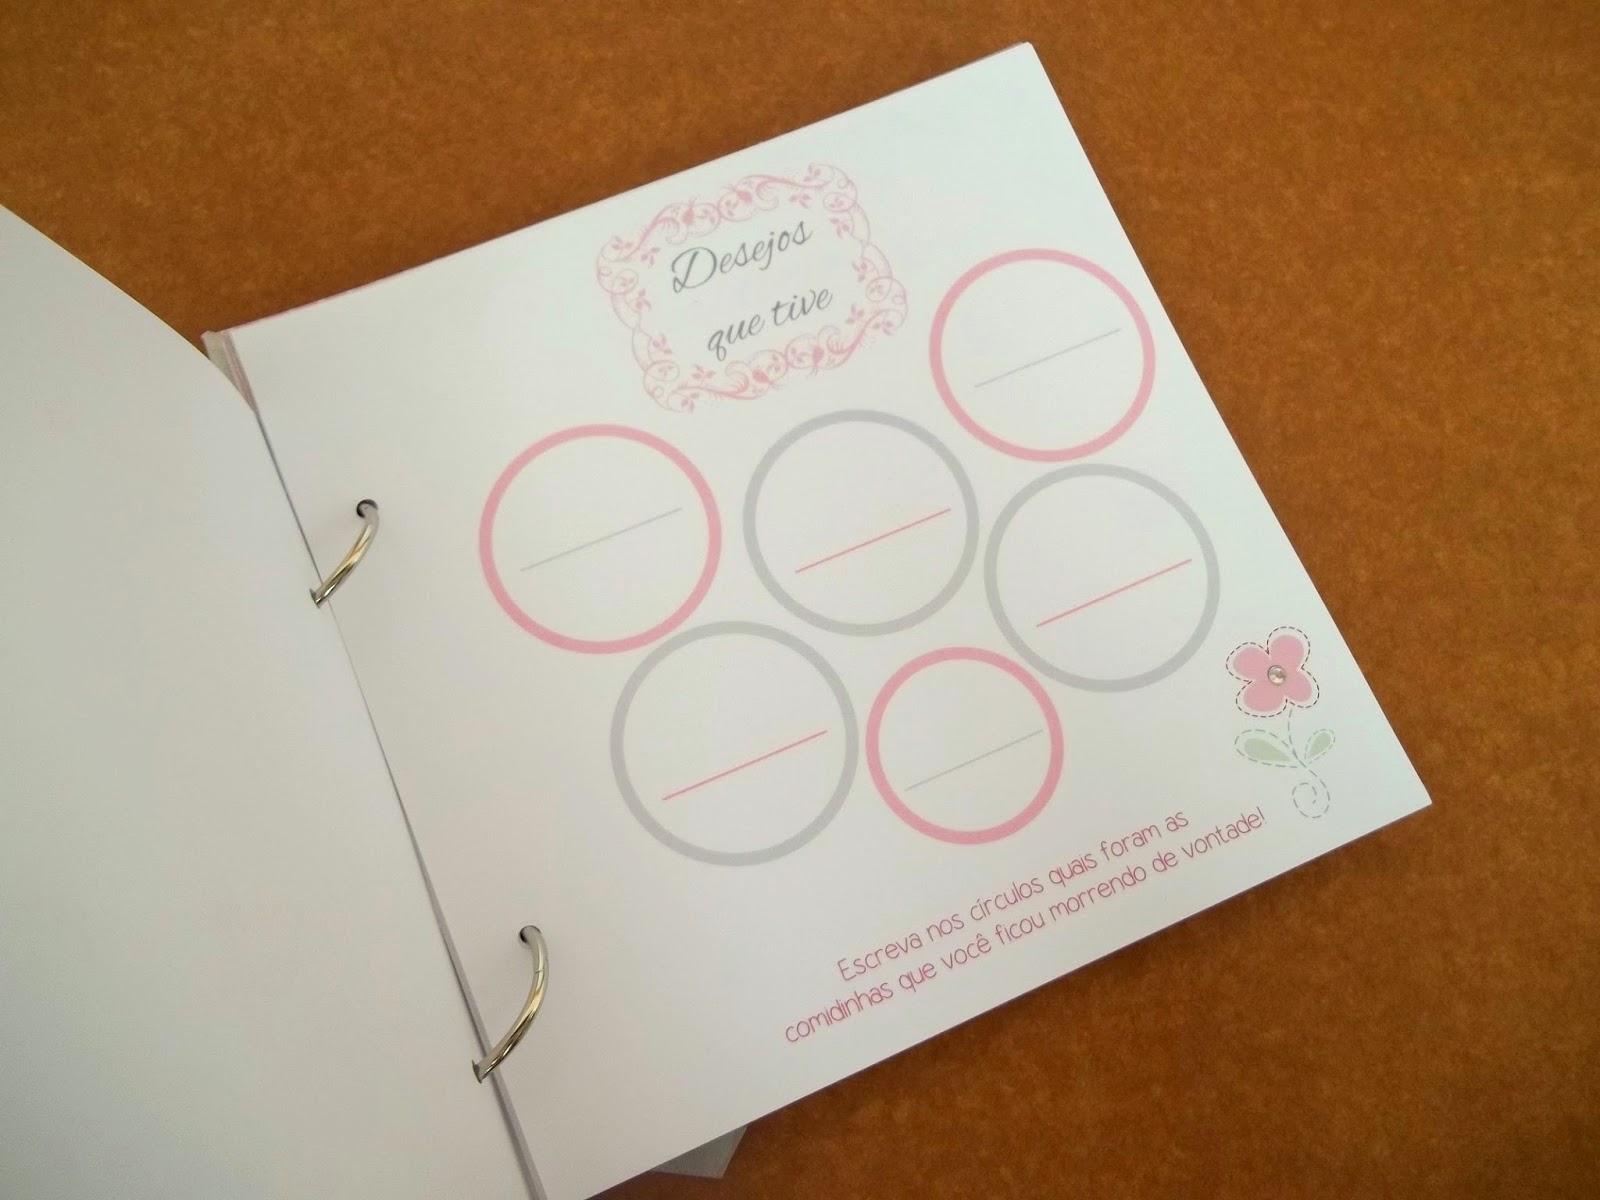 enxoval Sarah,álbum gravidez scrapbook, álbum da gravidez personalizado, registro da gravidez